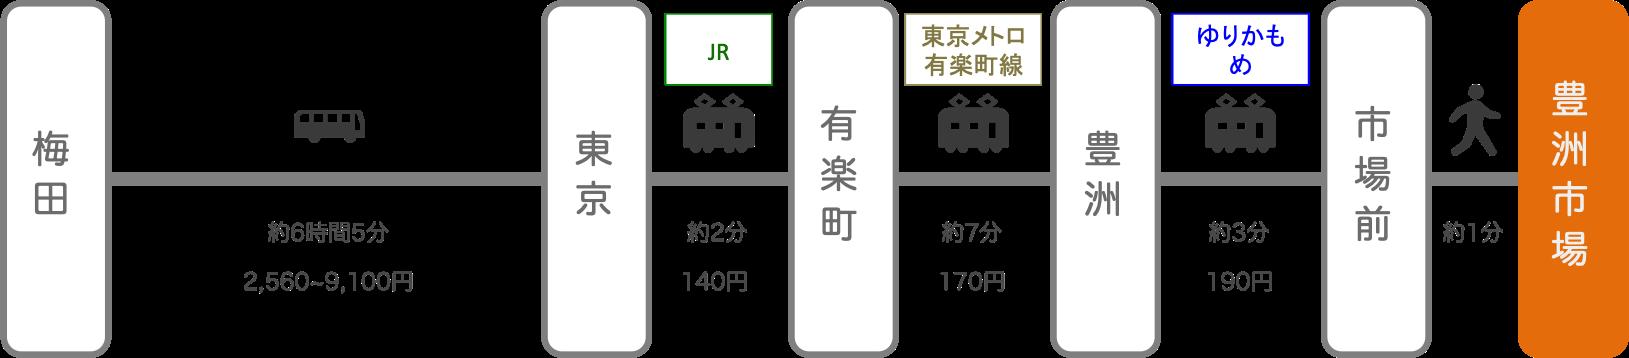 豊洲市場_大阪_高速バス